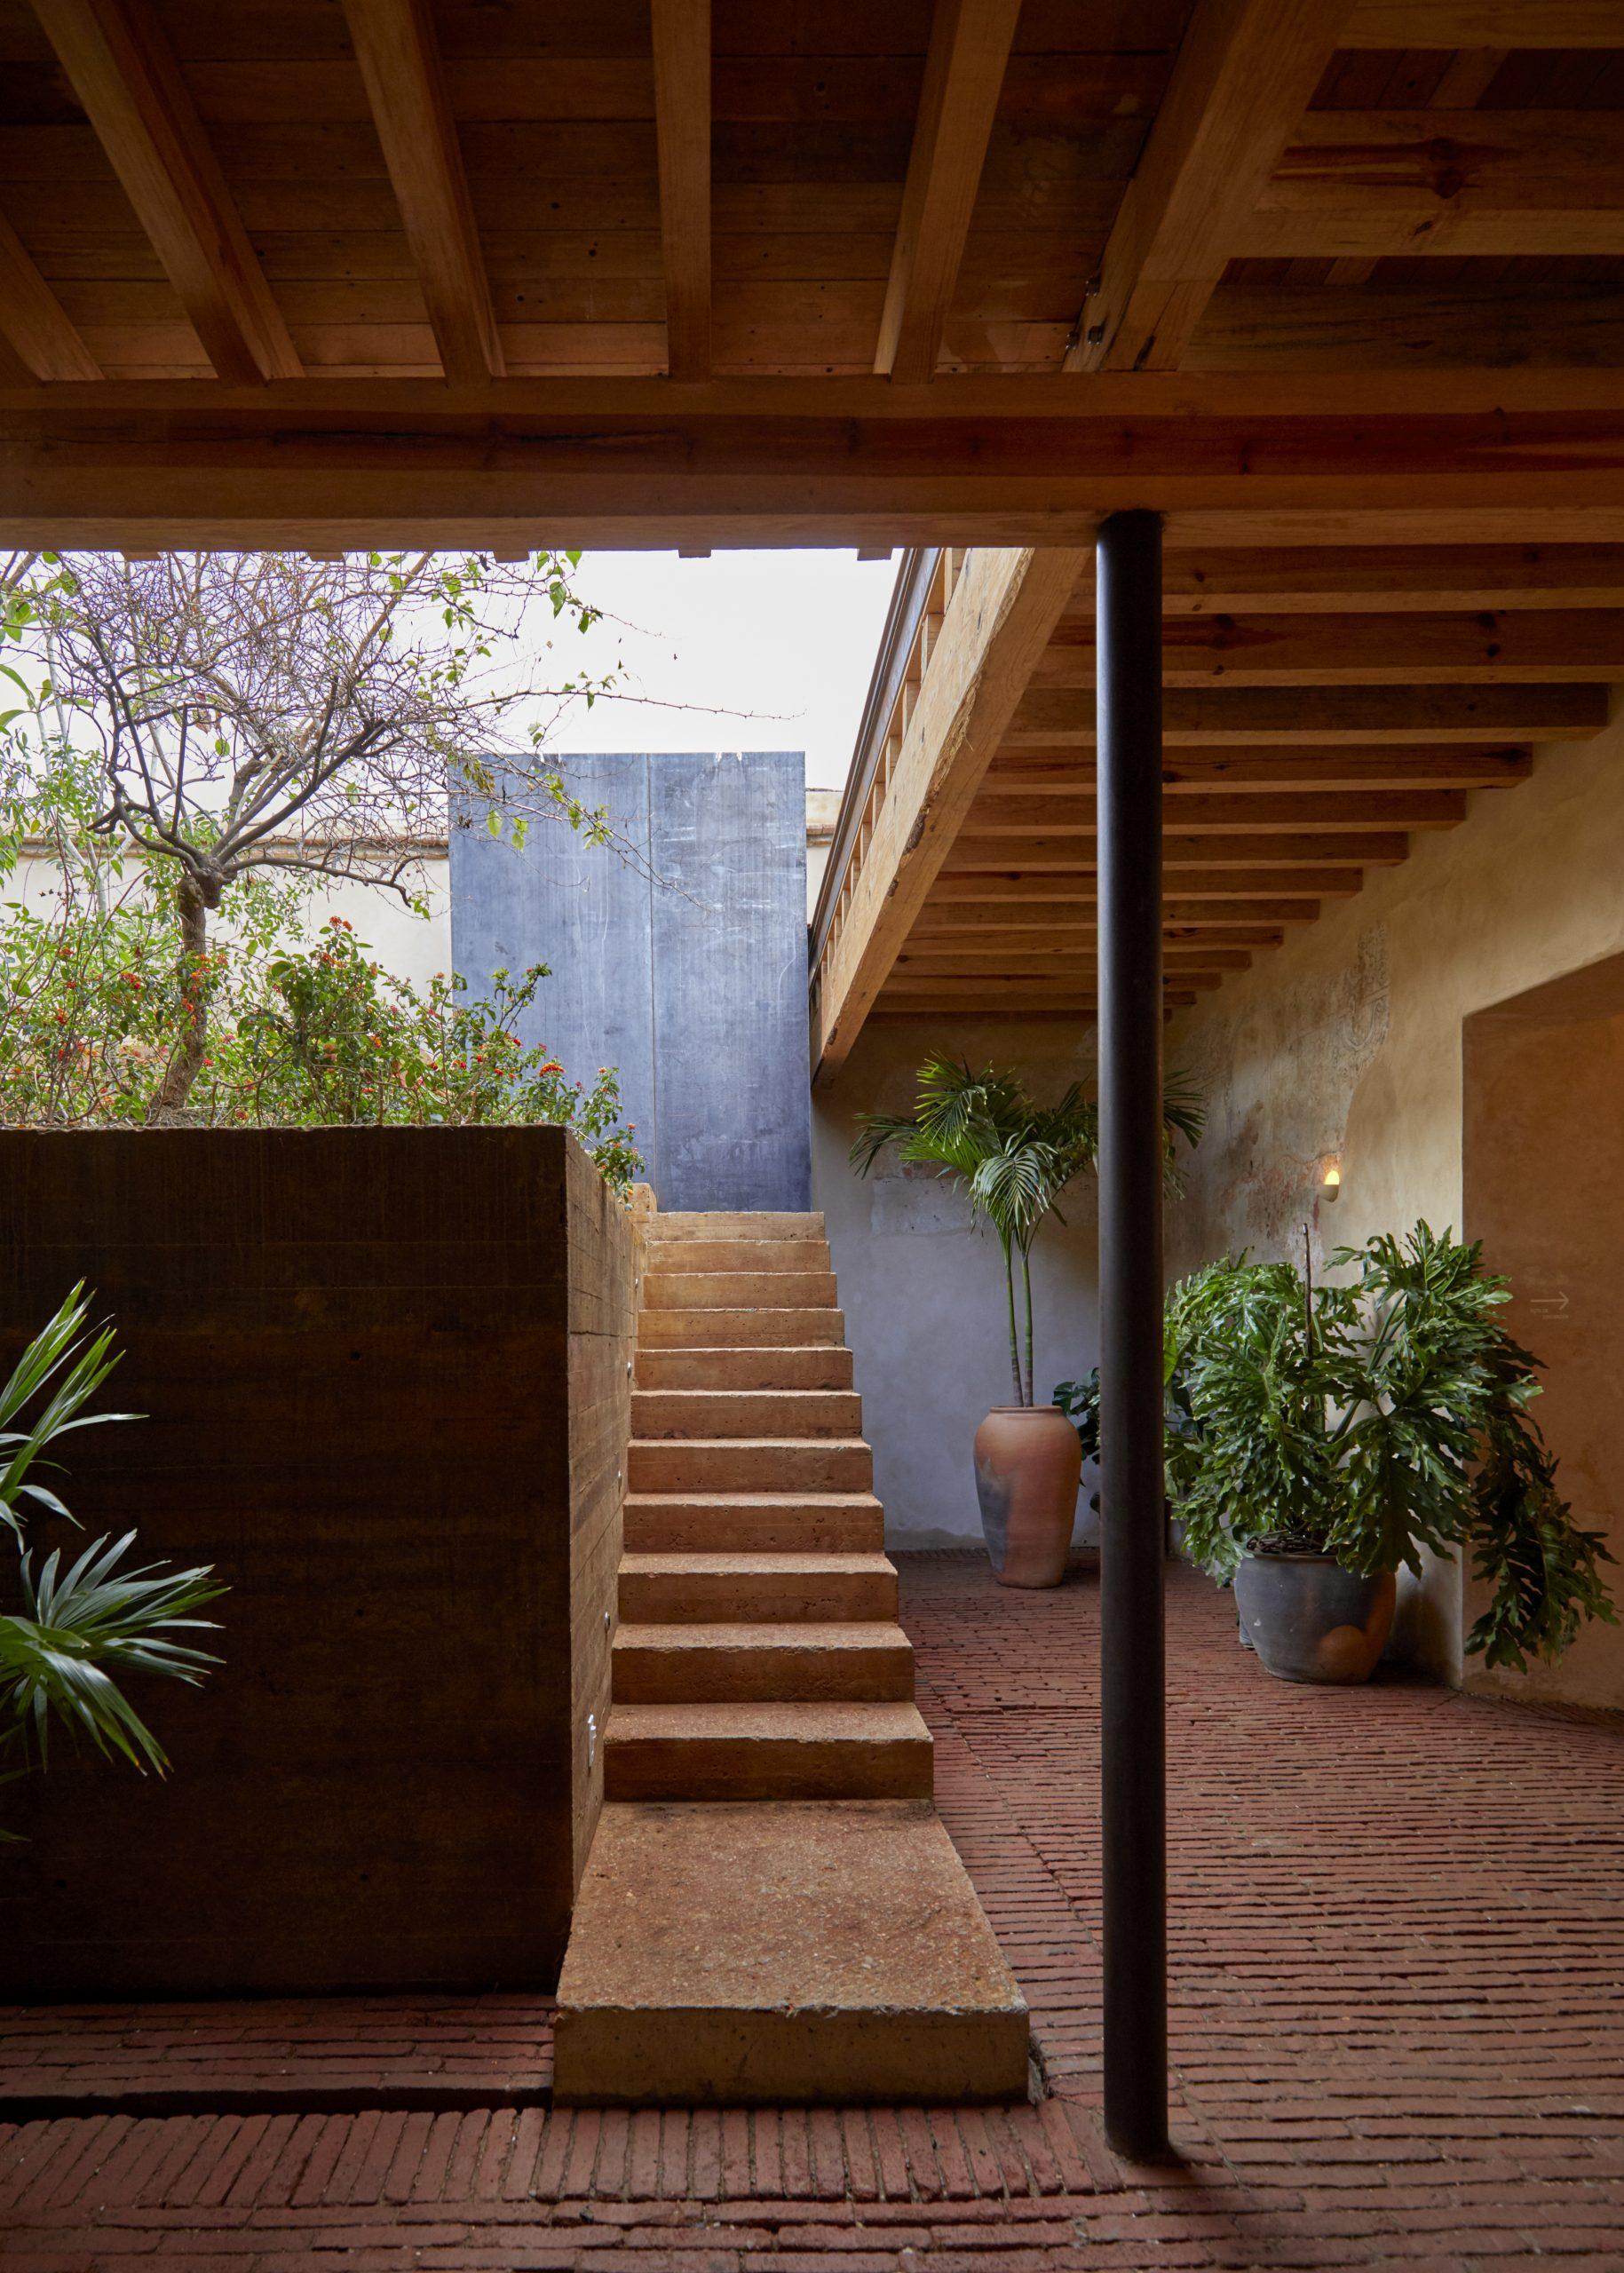 Hotel Escondido, Oaxaca, MX by Grupo Habita